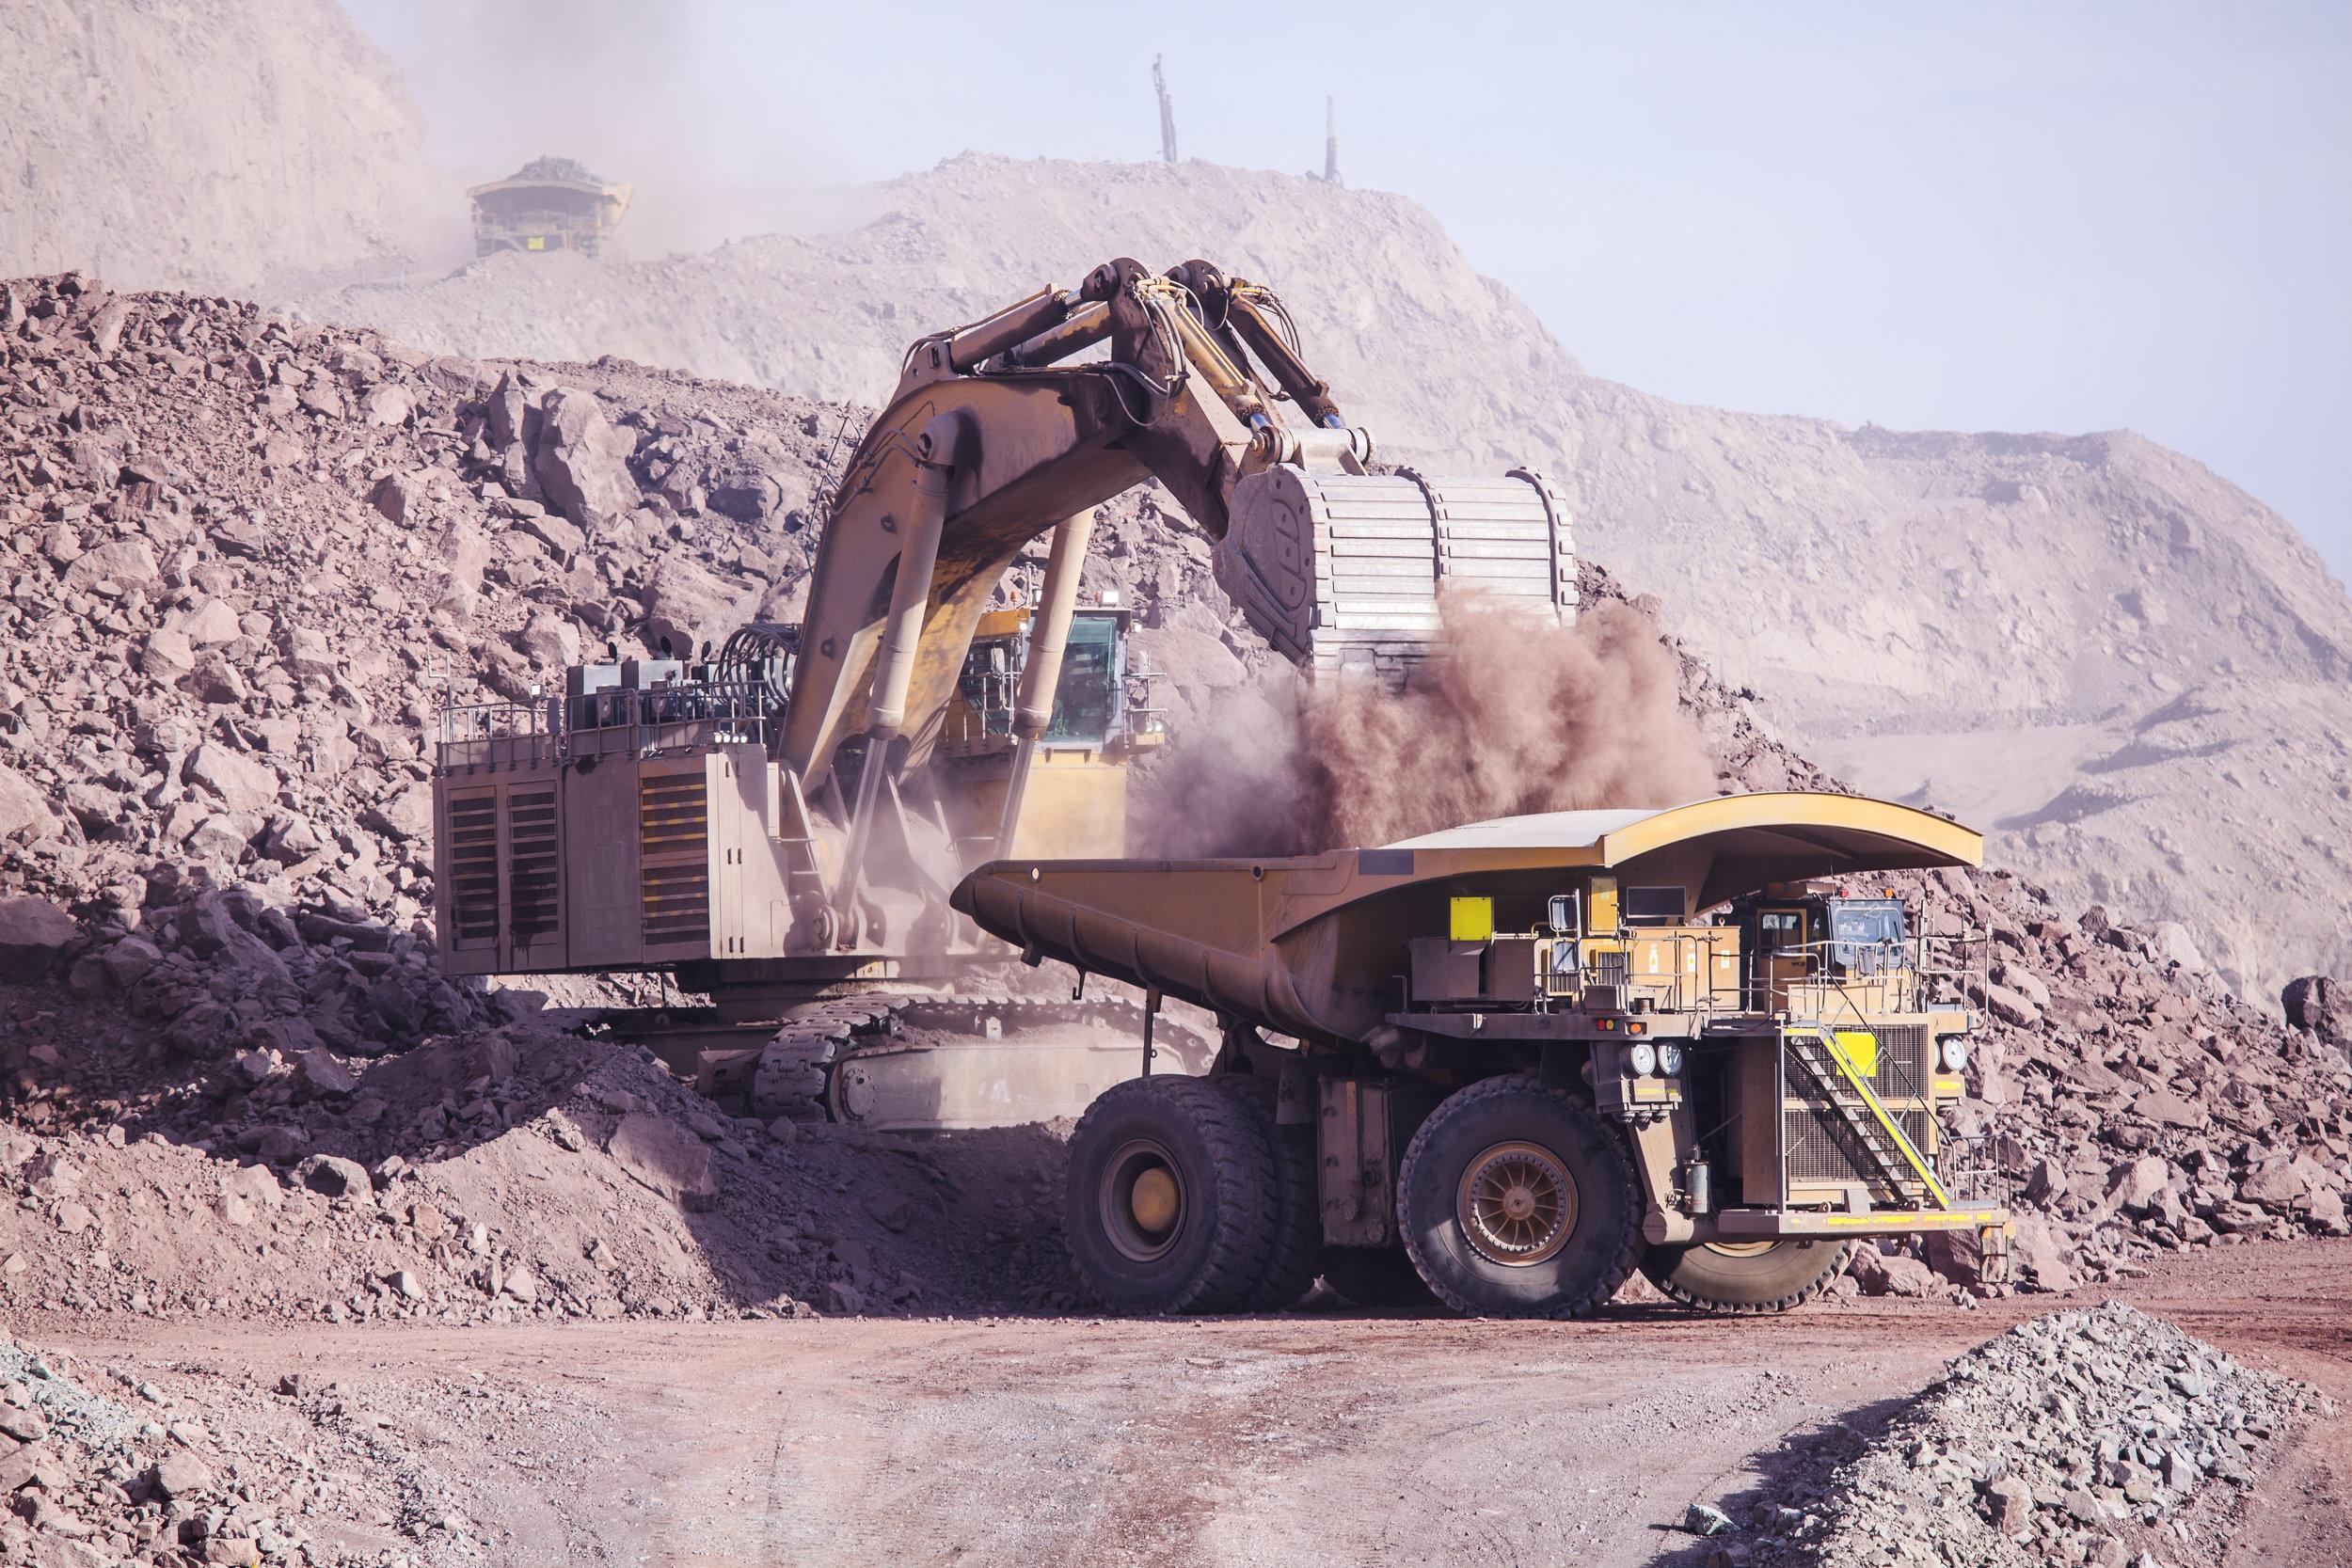 Excavator loading Haul truck(Best).jpeg